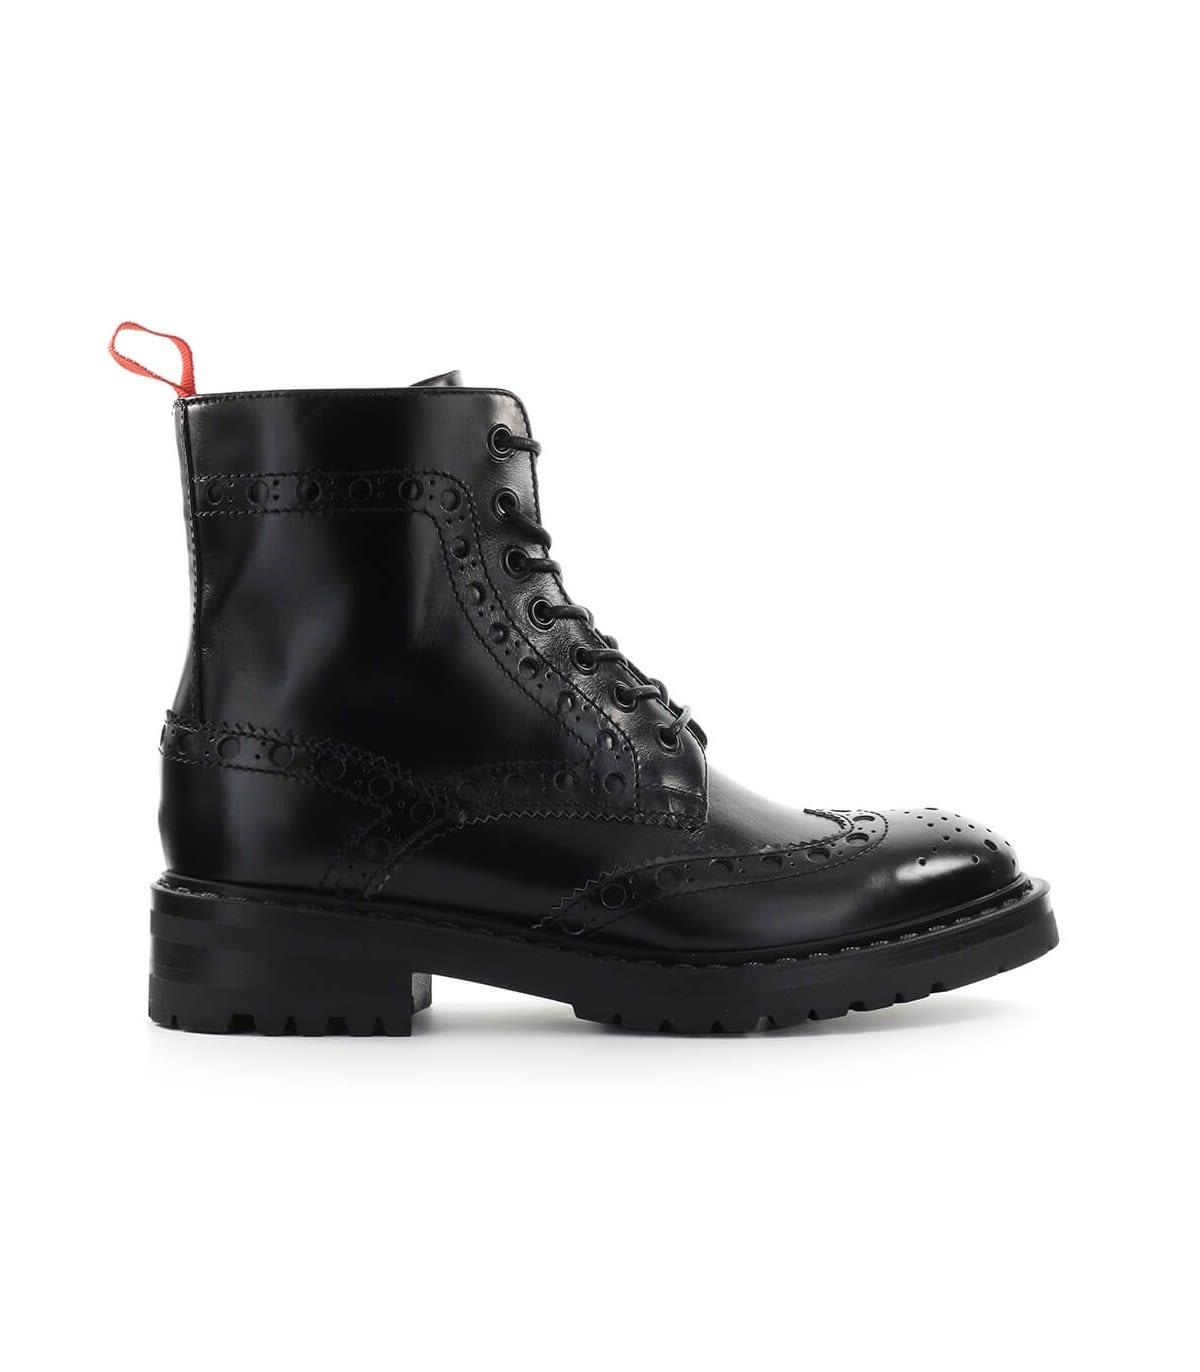 Barracuda Black Leather Combat Boot